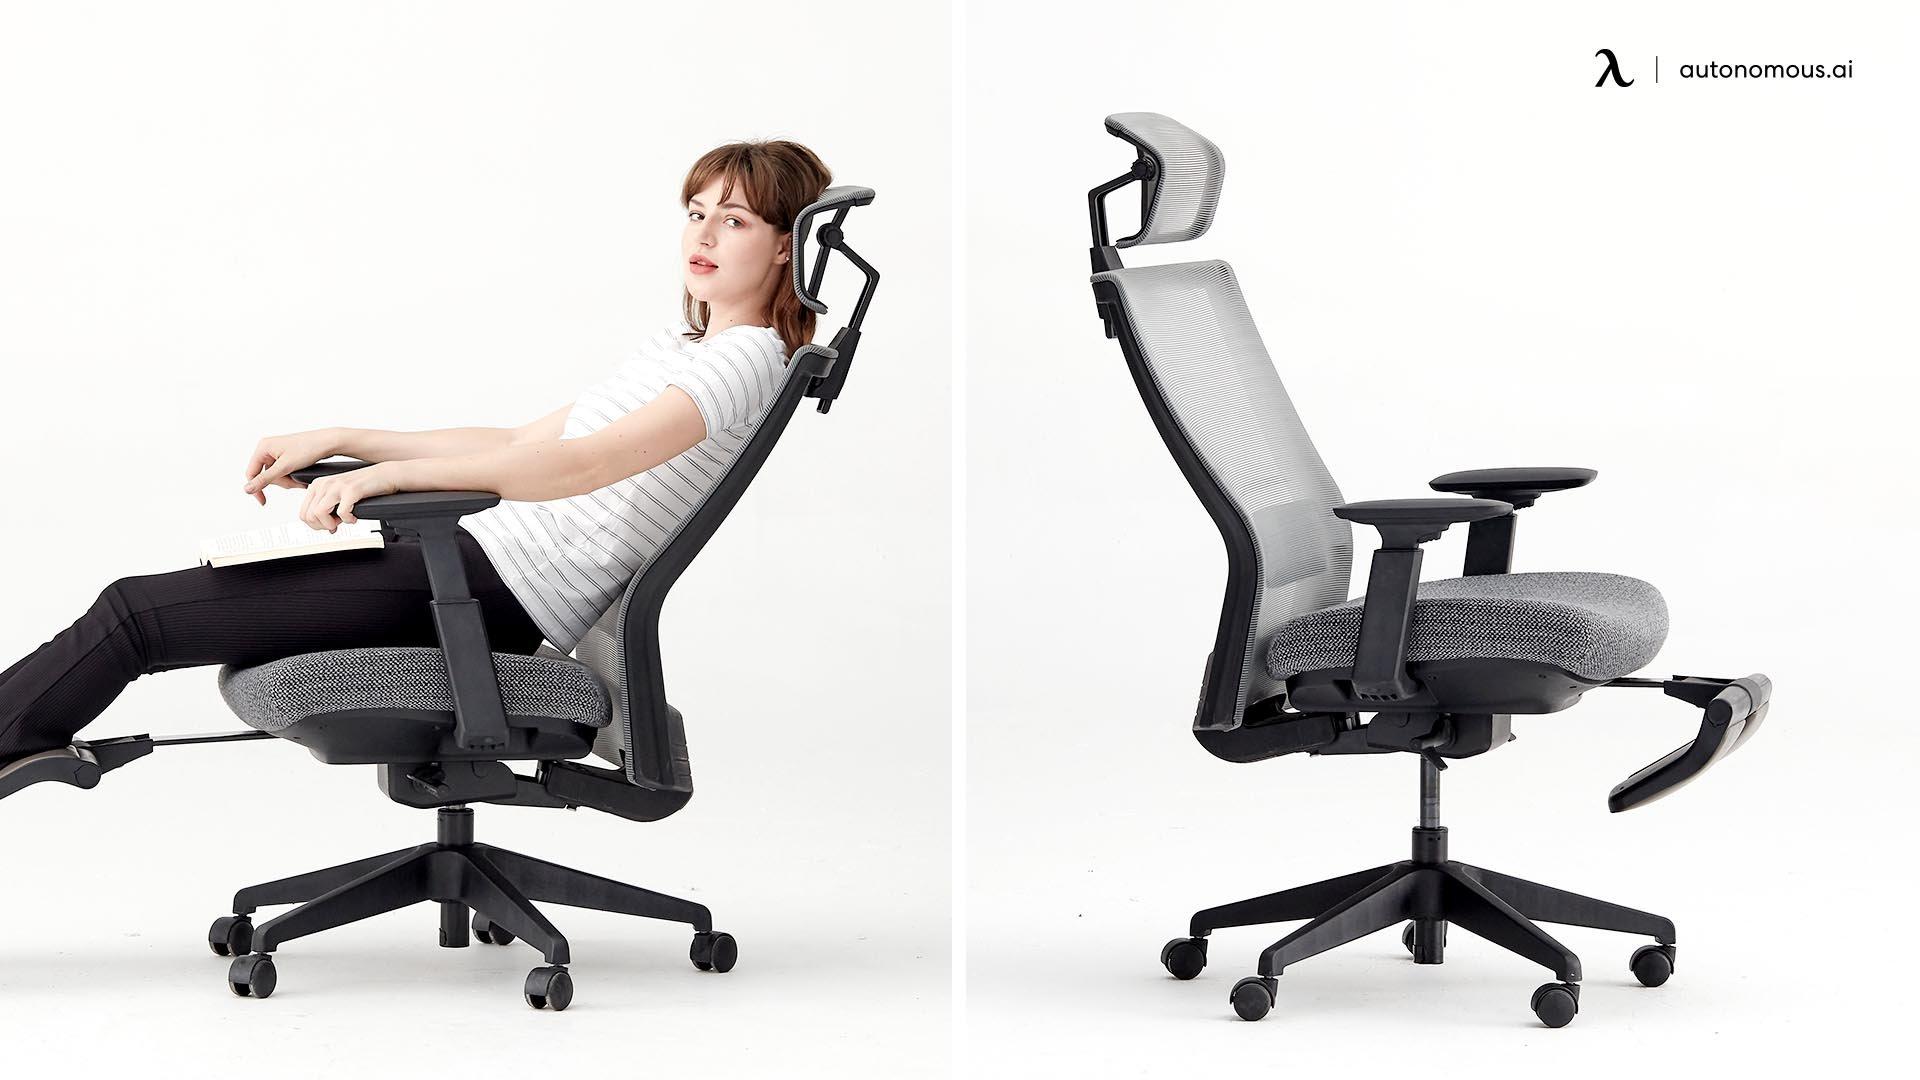 Rest your back on the backrest firmly